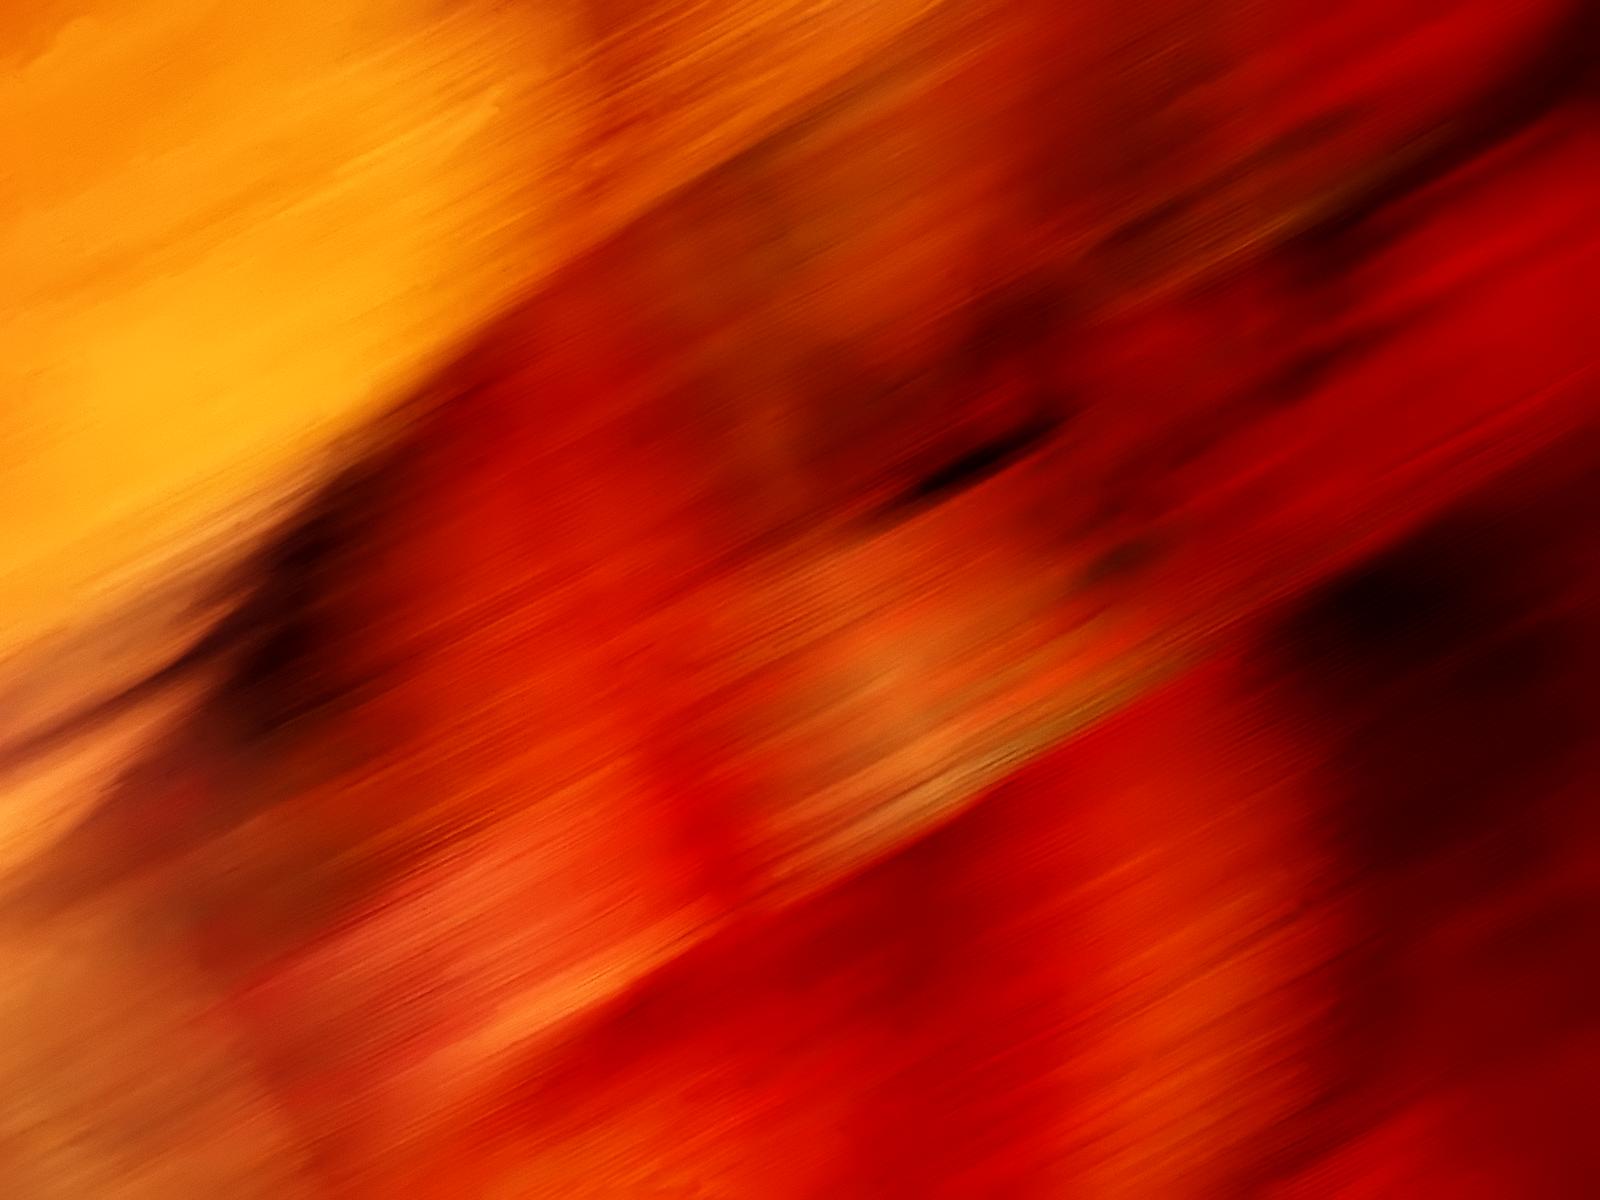 47+ Red and Orange Wallpaper on WallpaperSafari